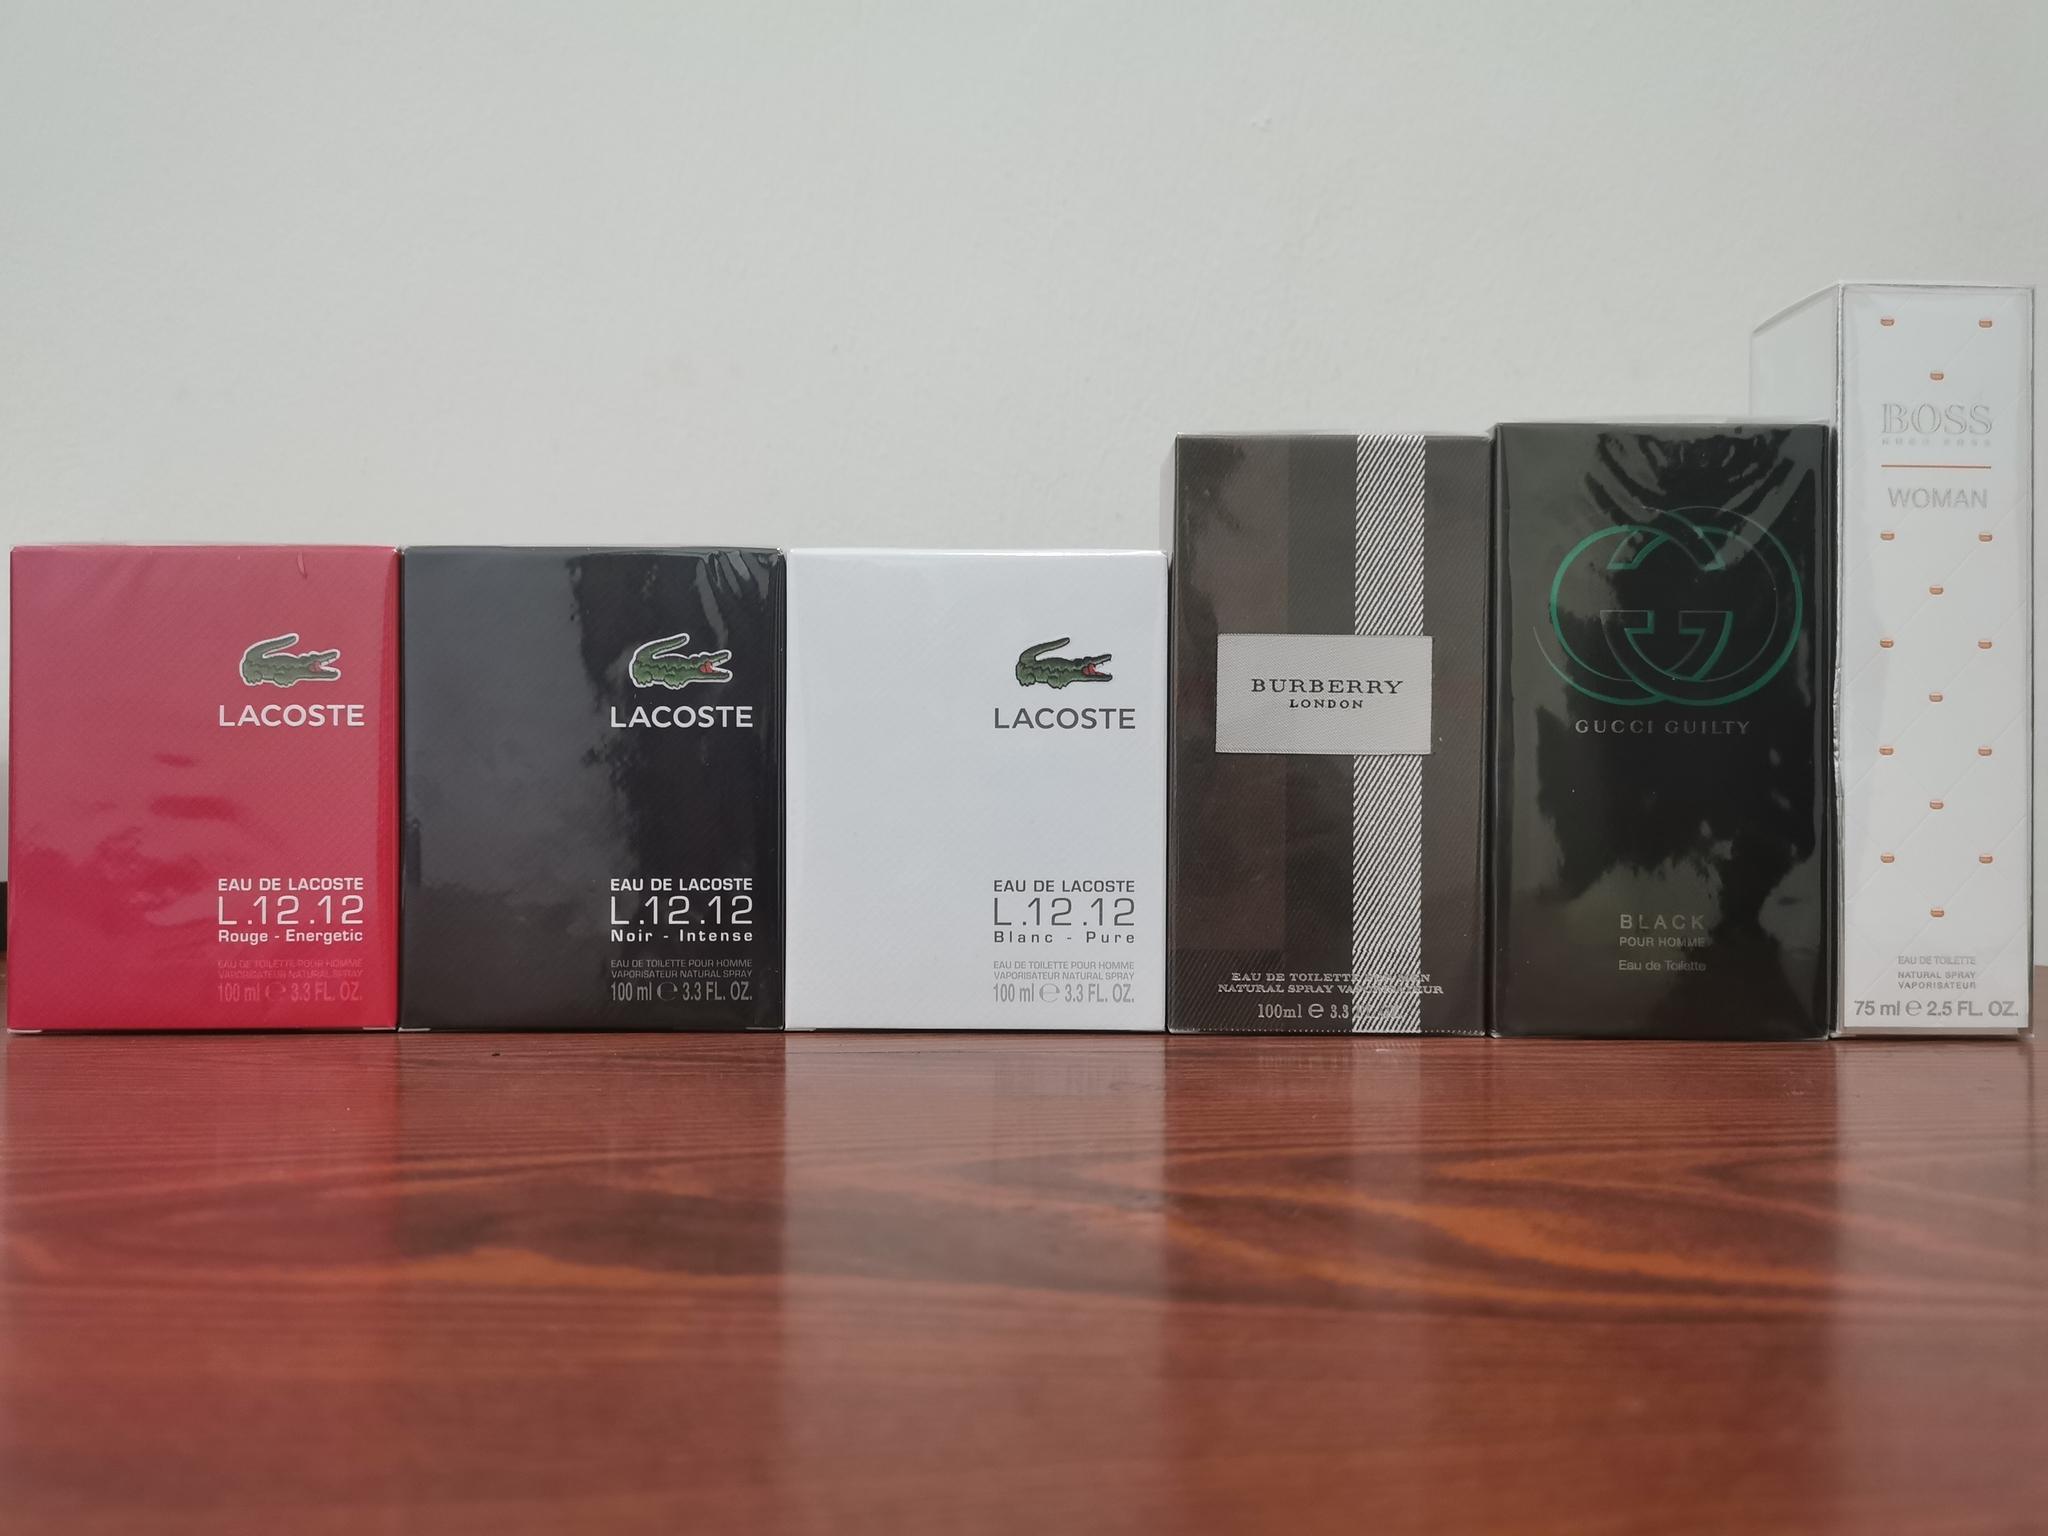 Perfumes Original - For Sale